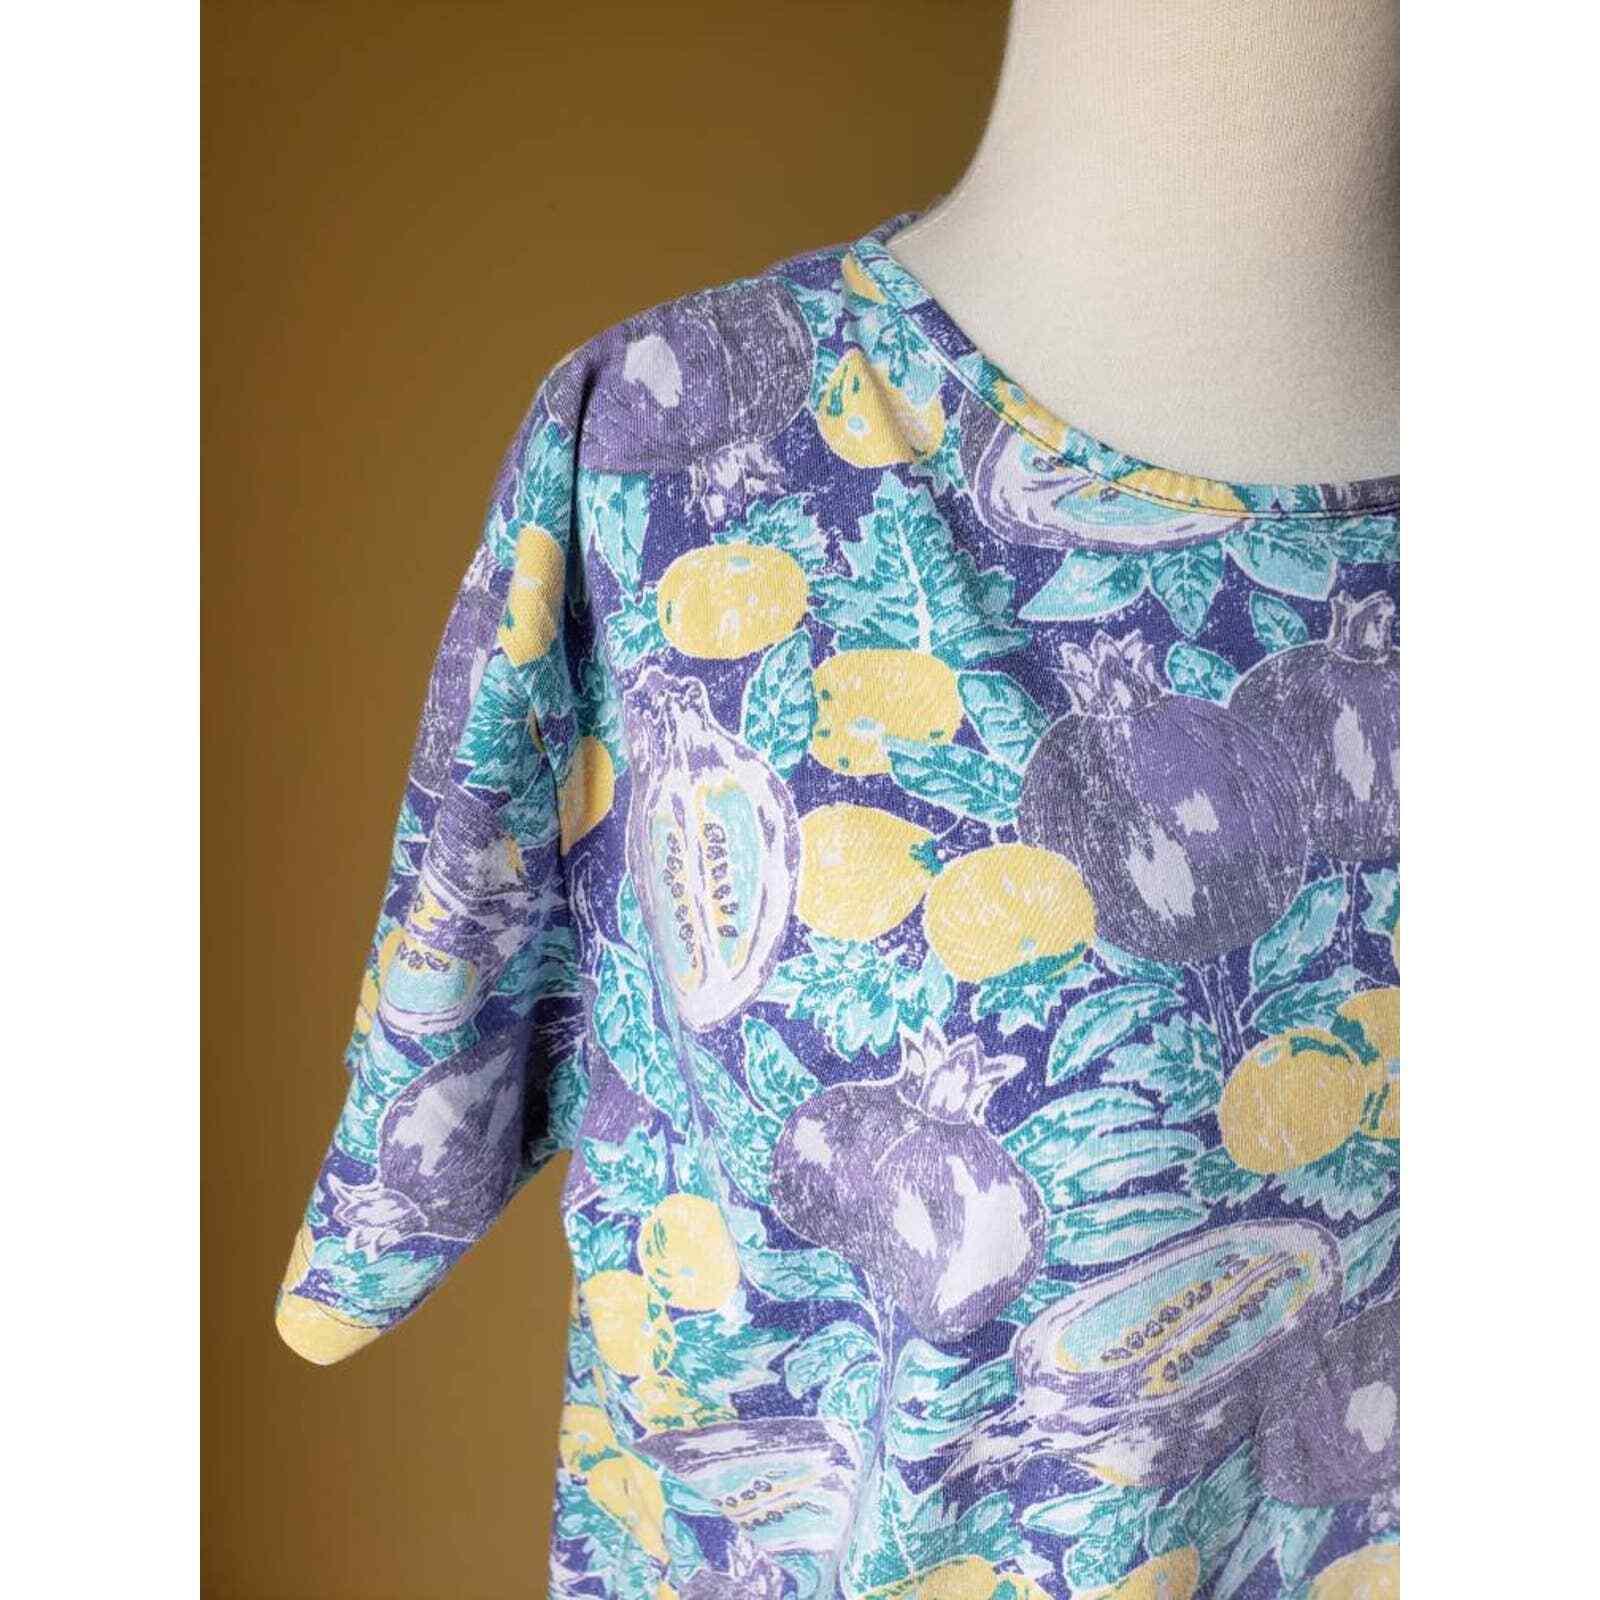 Vintage Laura Ashley shift dress, 90s dress, lemo… - image 5